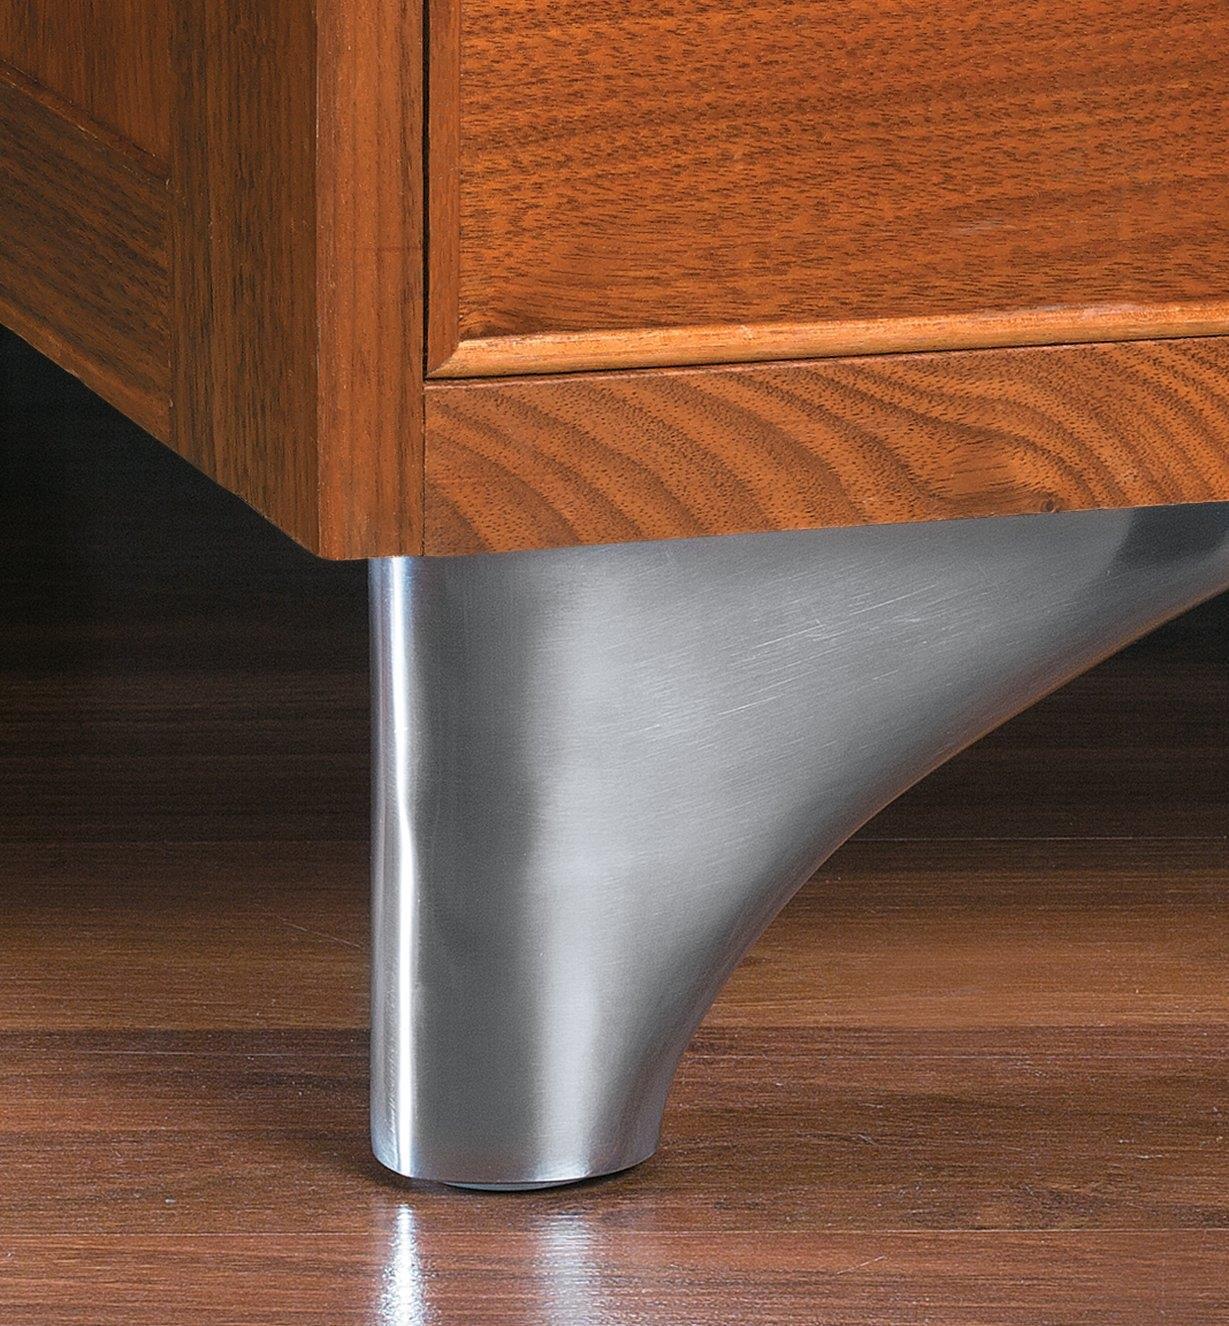 00S8163 - 100mm Aluminum Rounded Leg, ea.